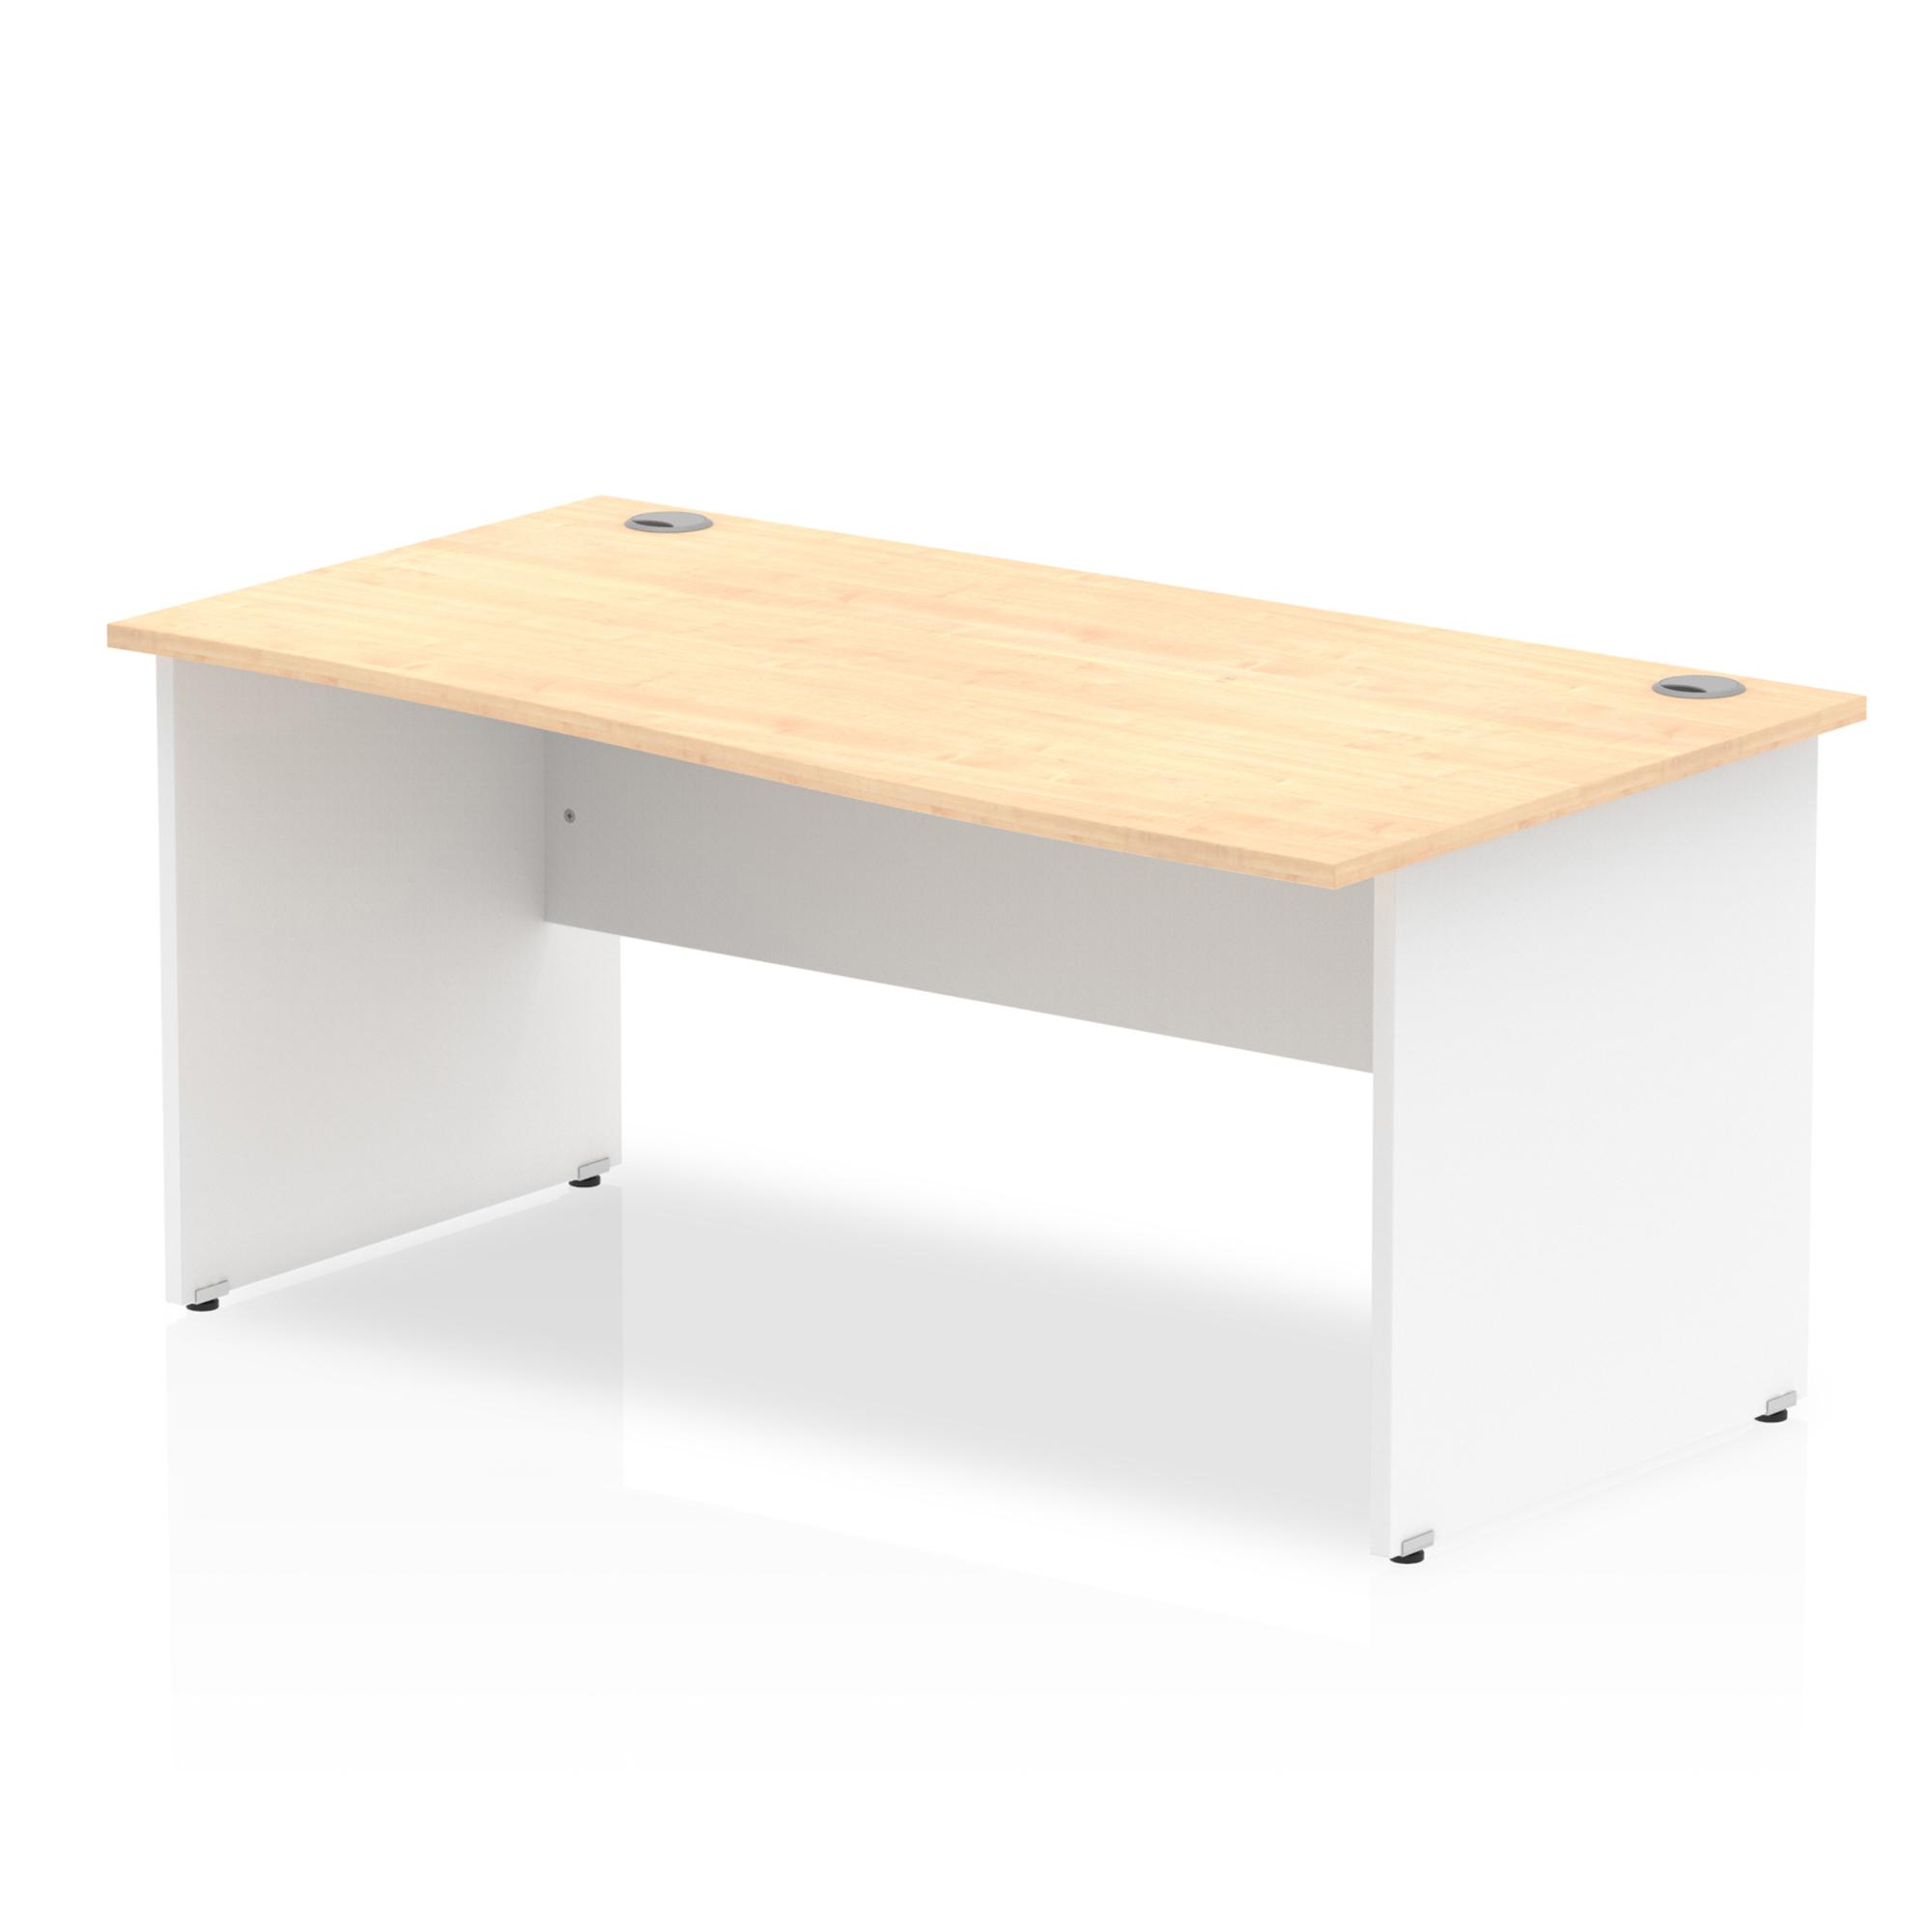 Trexus Desk Wave Right Hand Panel End 1600x800mm Maple Top White Panels Ref TT000120